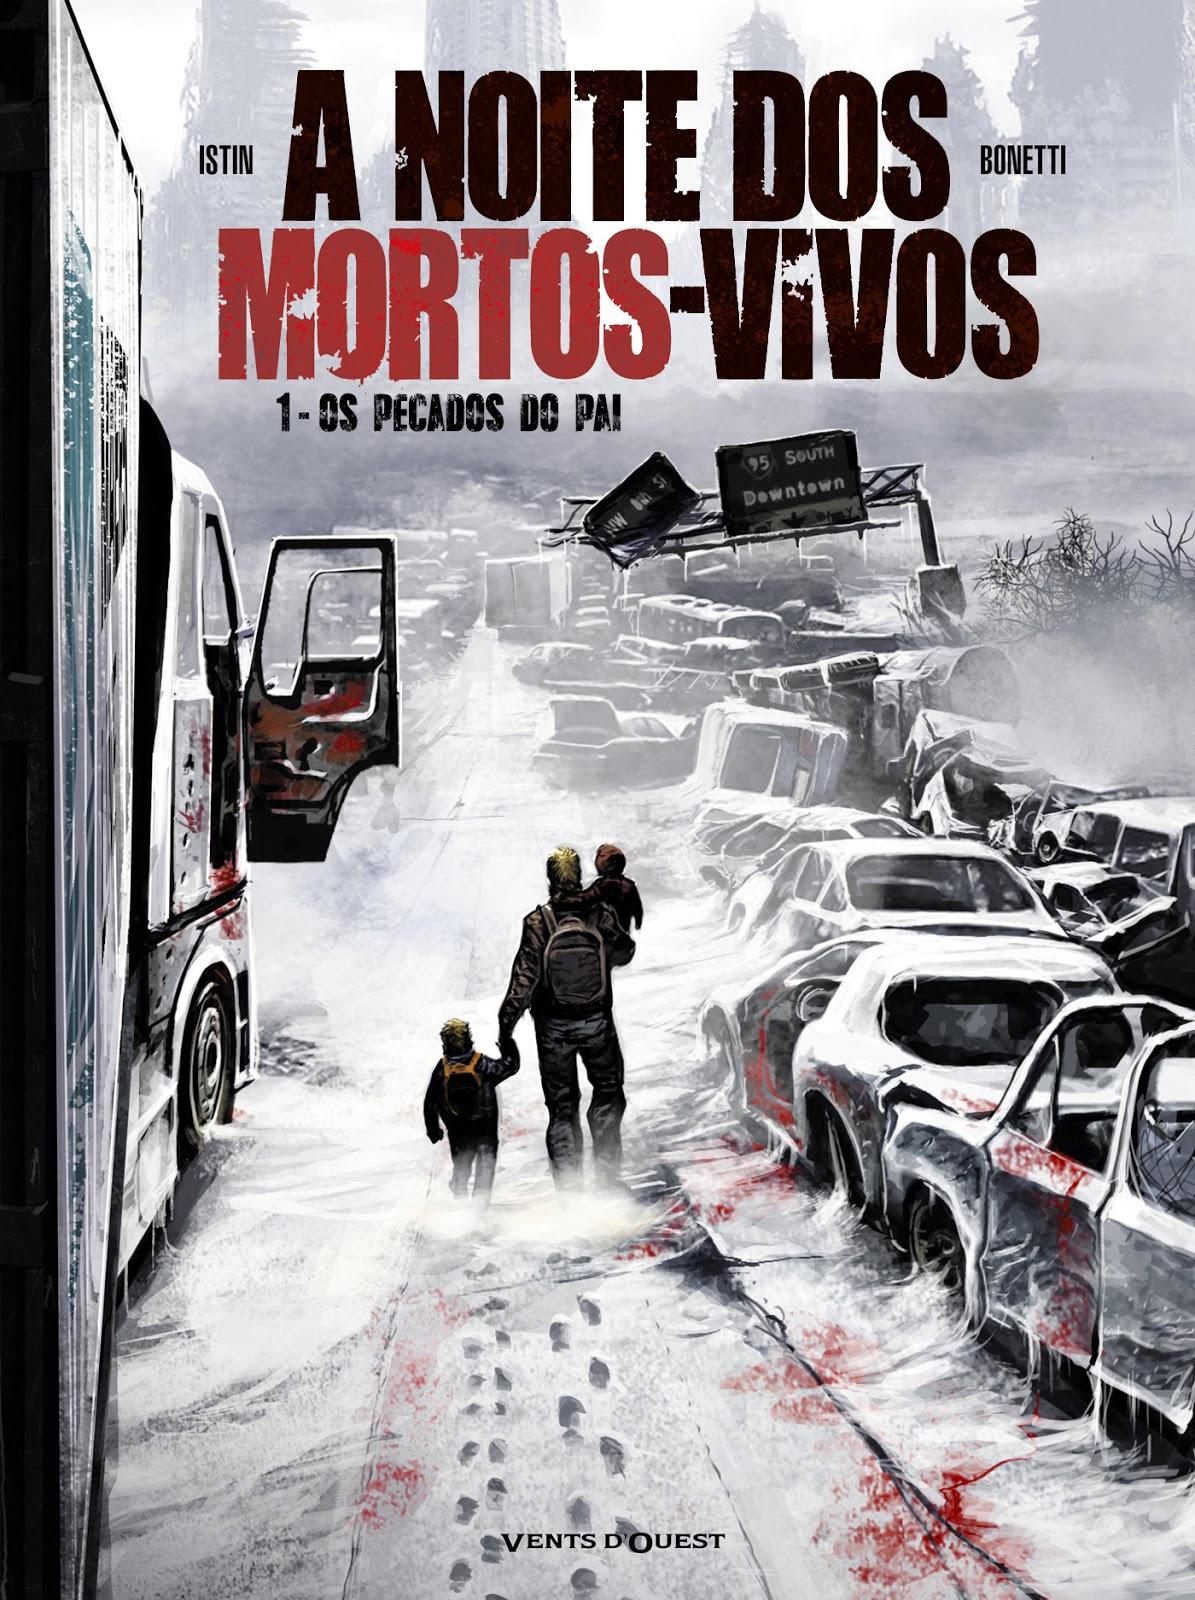 Filme Mortos Vivos for ndrangheta & la realeza - 10 anos!: hq euro: a noite dos mortos